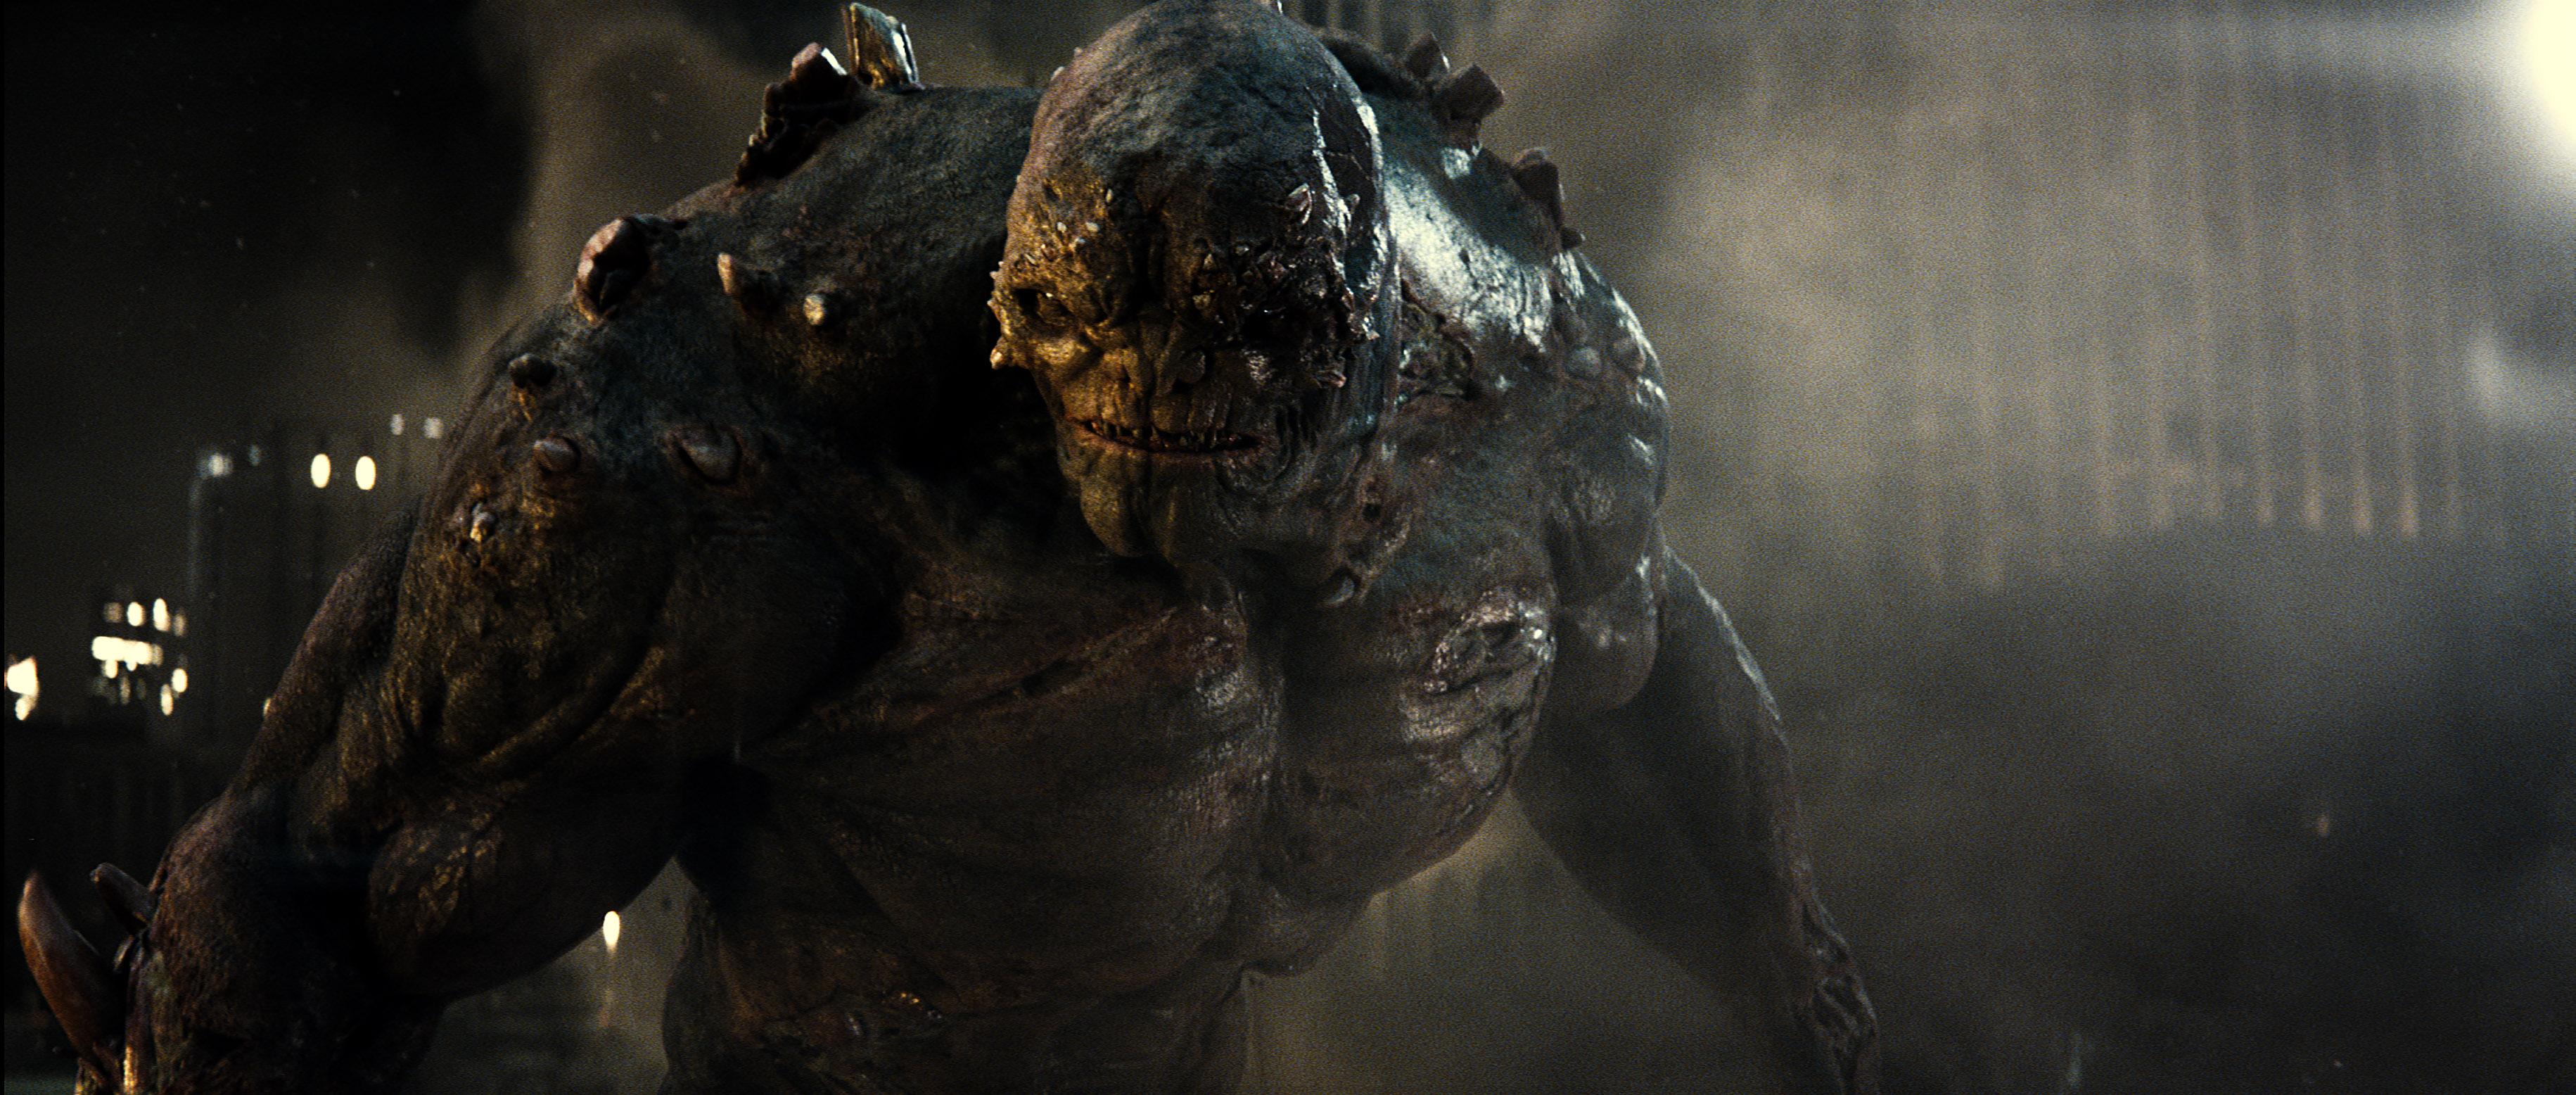 Zack Snyder; Apocalypse; DCEU